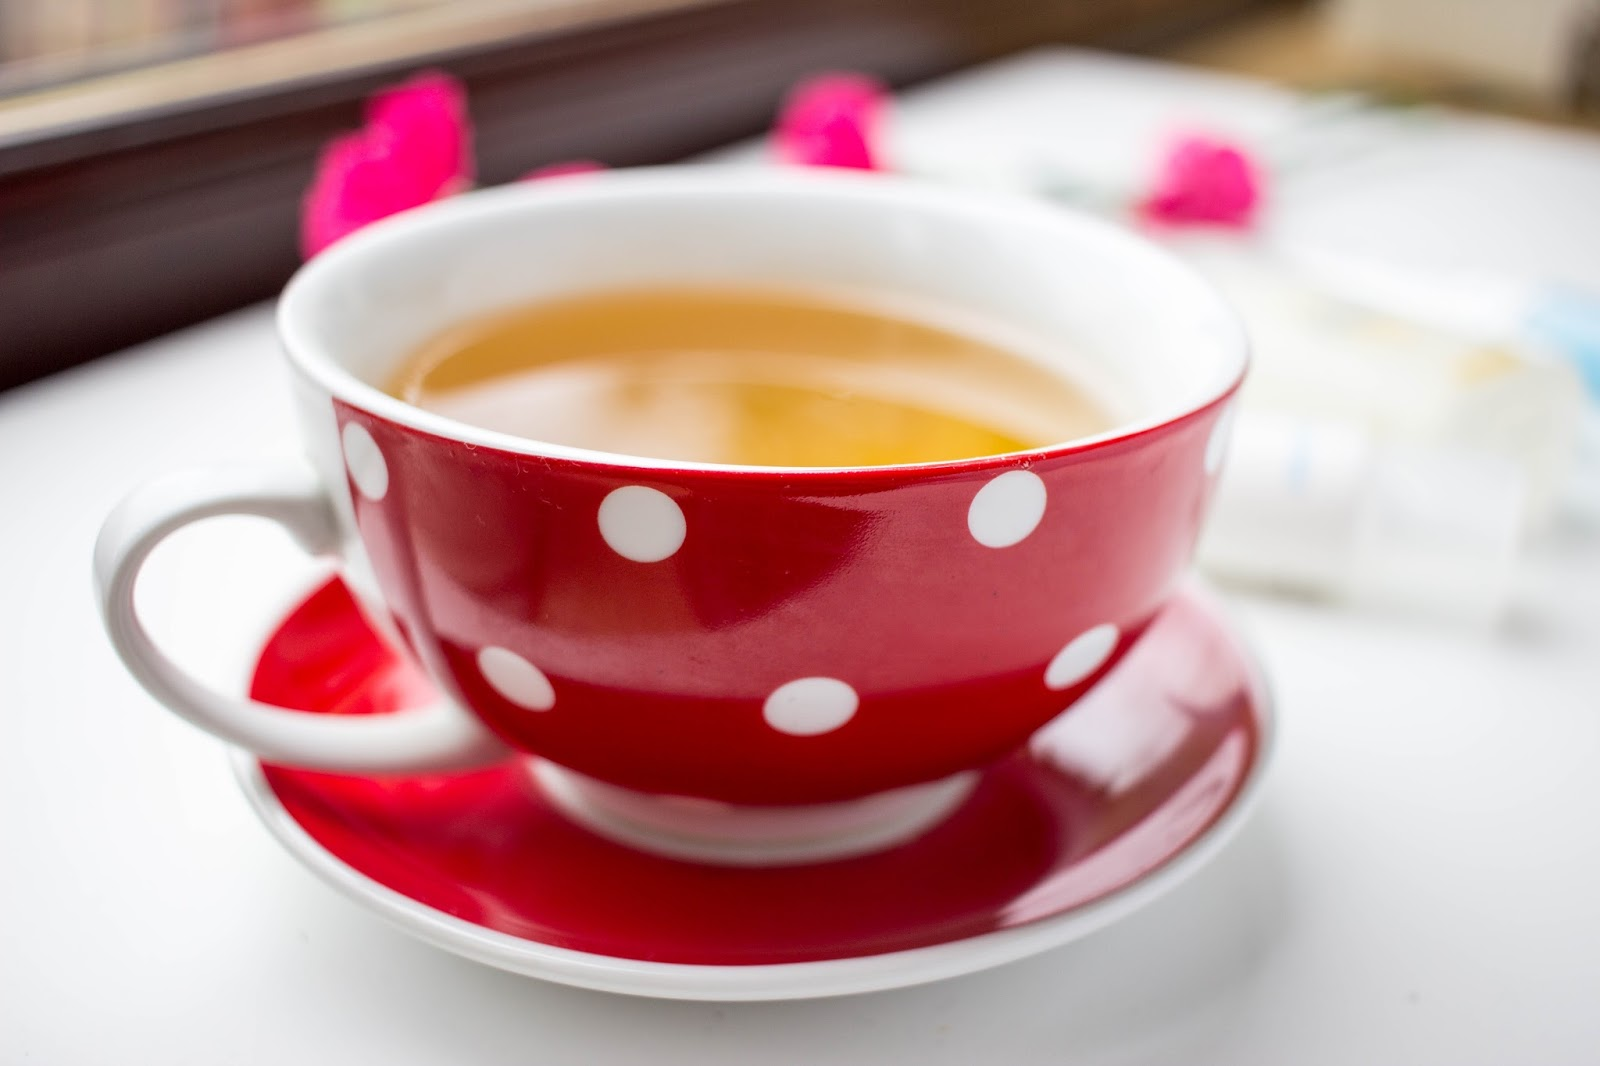 Tea, Green tea, healthy, healthy bloggers, beauty bloggers, lifestyle bloggers, Derbyshire bloggers, Katie Writes,